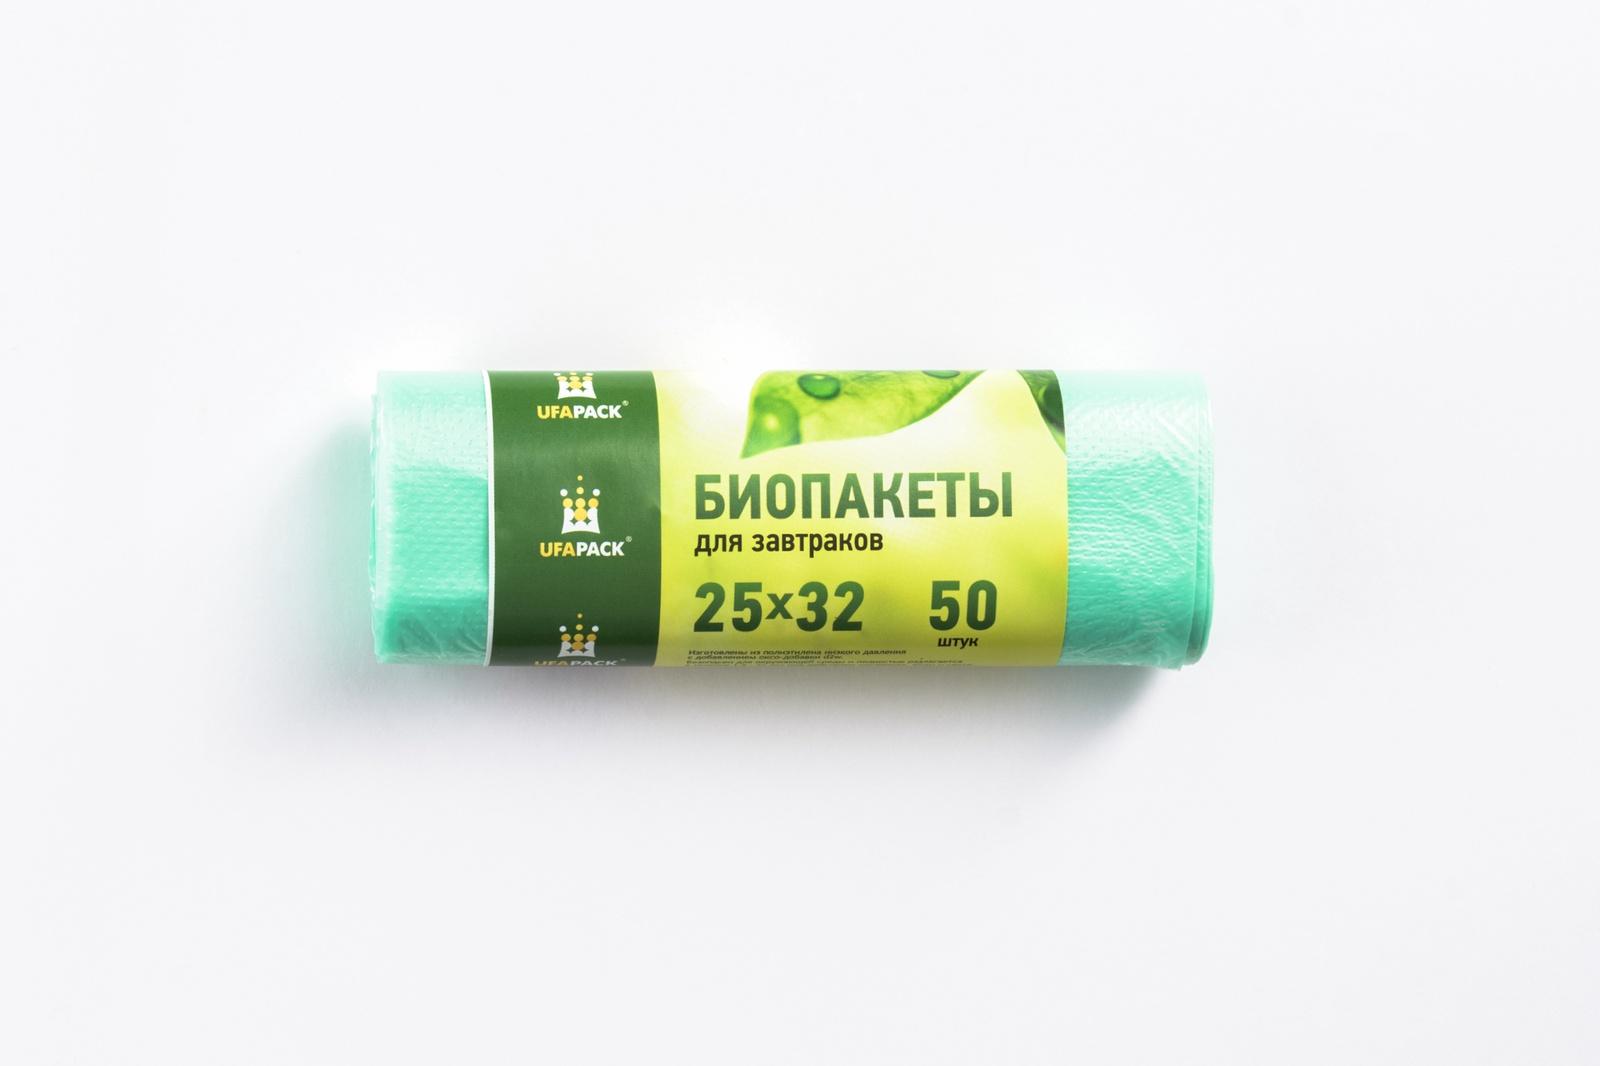 Пакеты для приготовления UFAPACK д/ завтрака (25х32) separett пакеты биоразлагаемые 1127